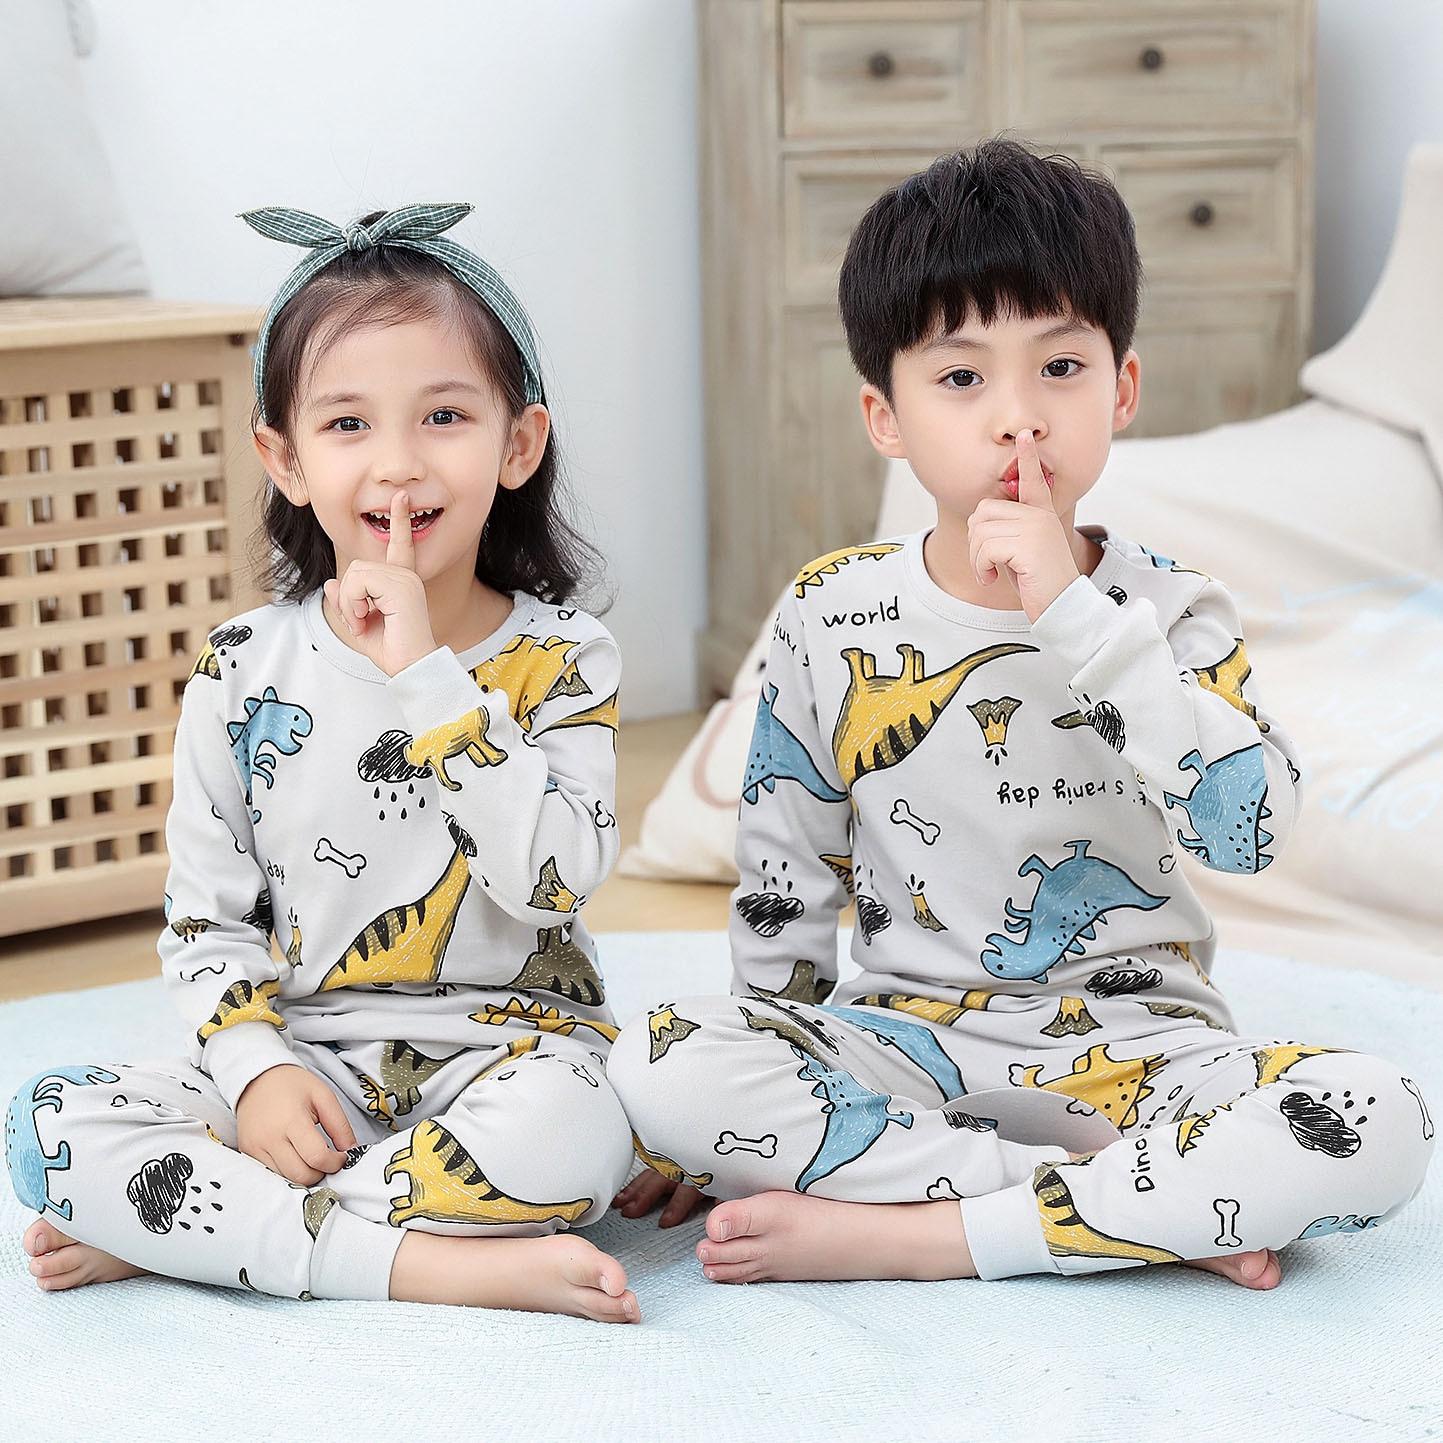 Children Pajamas Boys Totoro Cotton Clothes Pants Set Cartoon Sleepwear Kids Pajamas For Girls Toddler Baby Outfits Child Pyjama 4